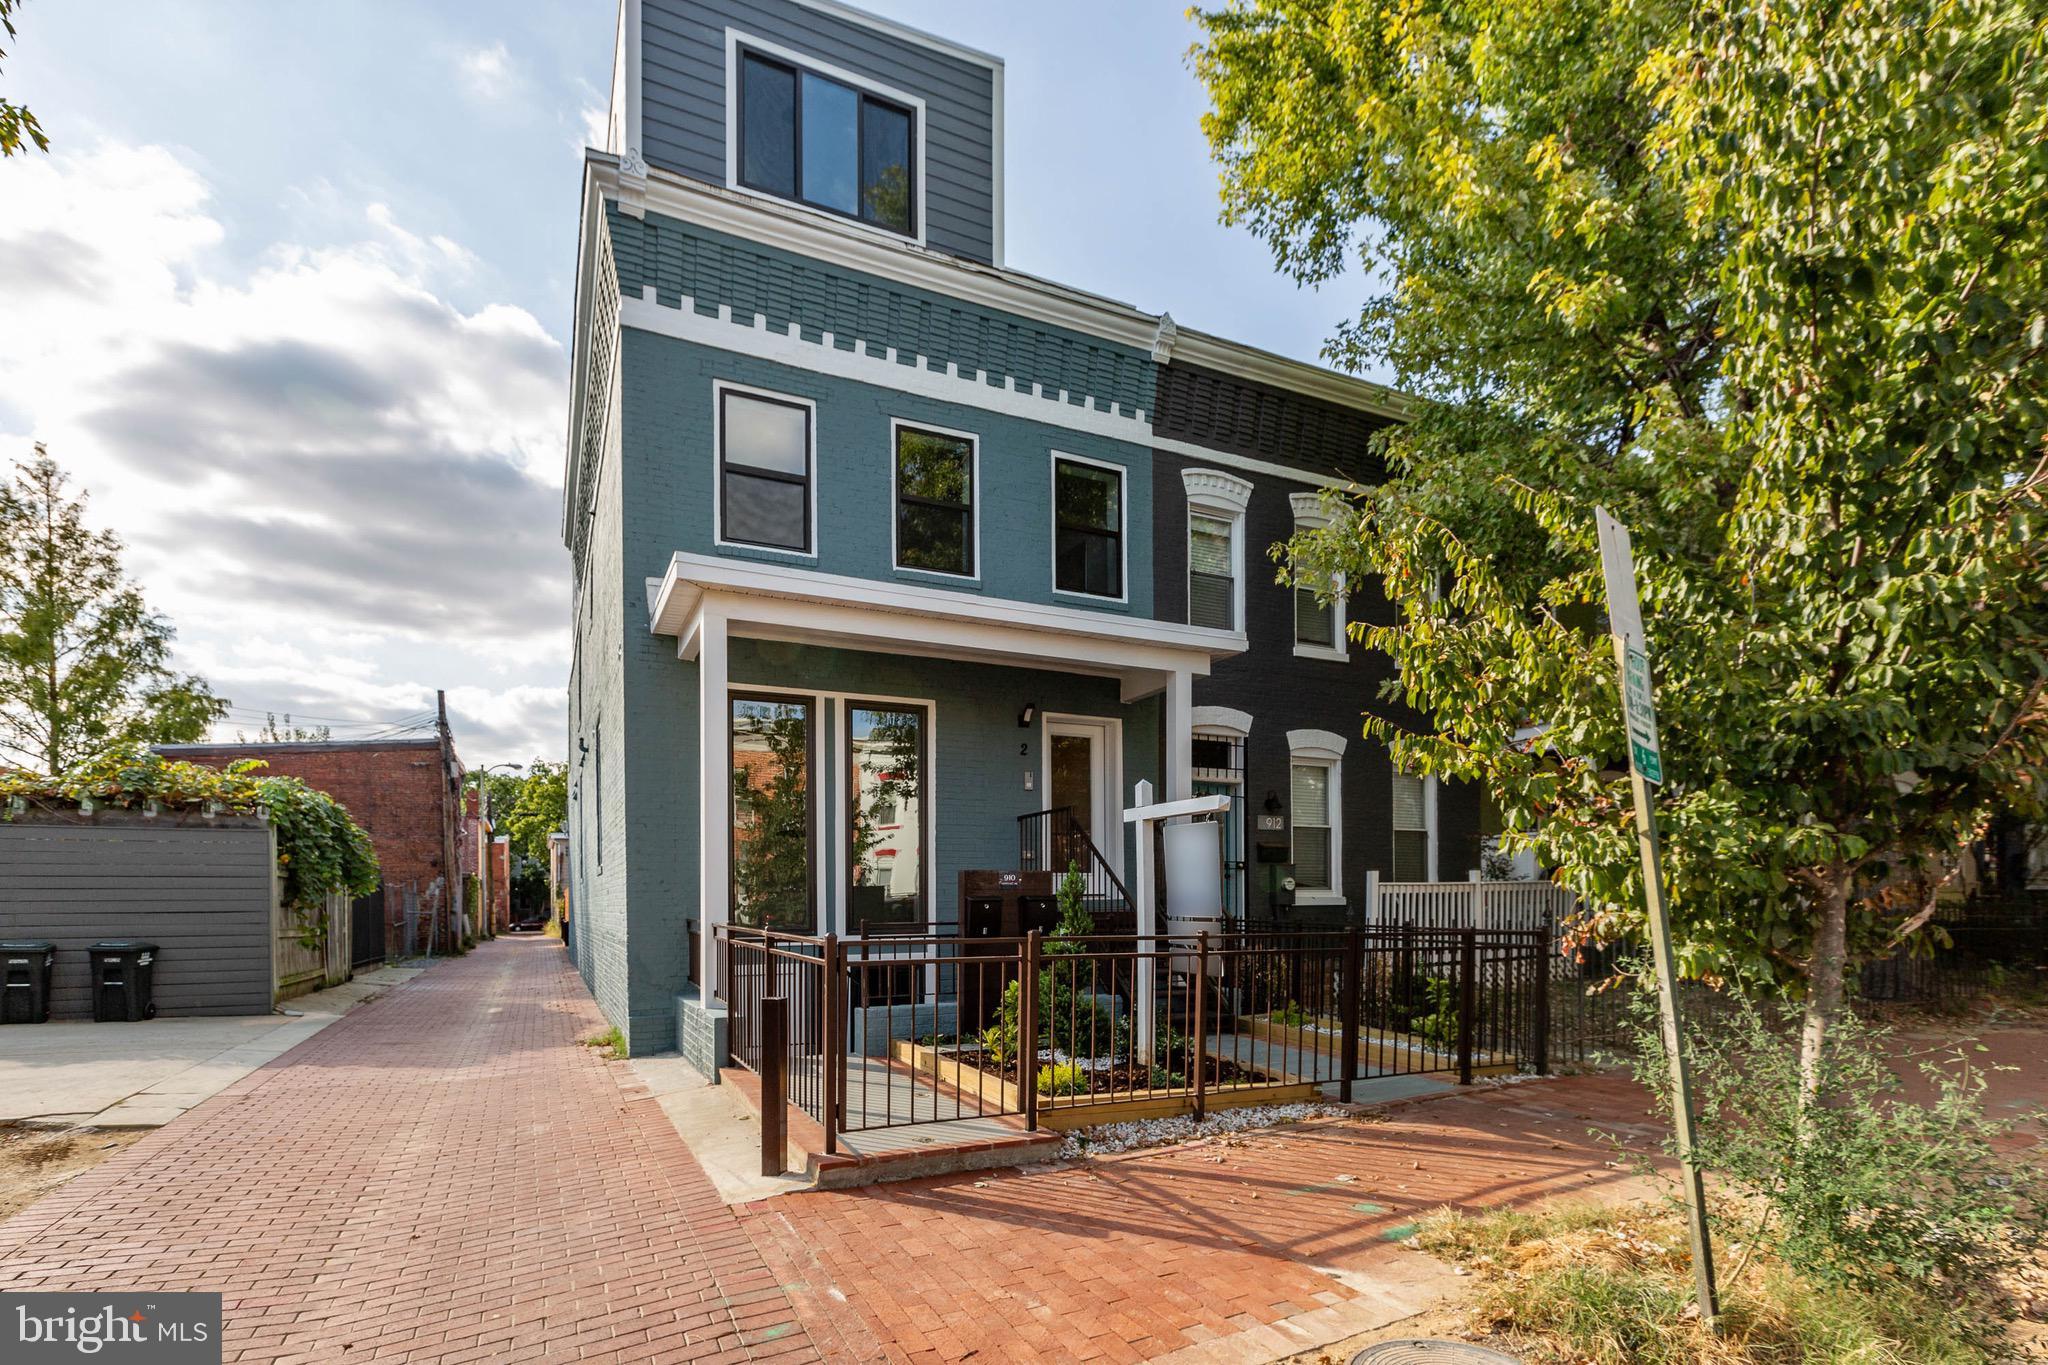 Welcome to 910 9th ST NE #1 & #2 condominium. This newly renovated semi-detached 2-unit condominium